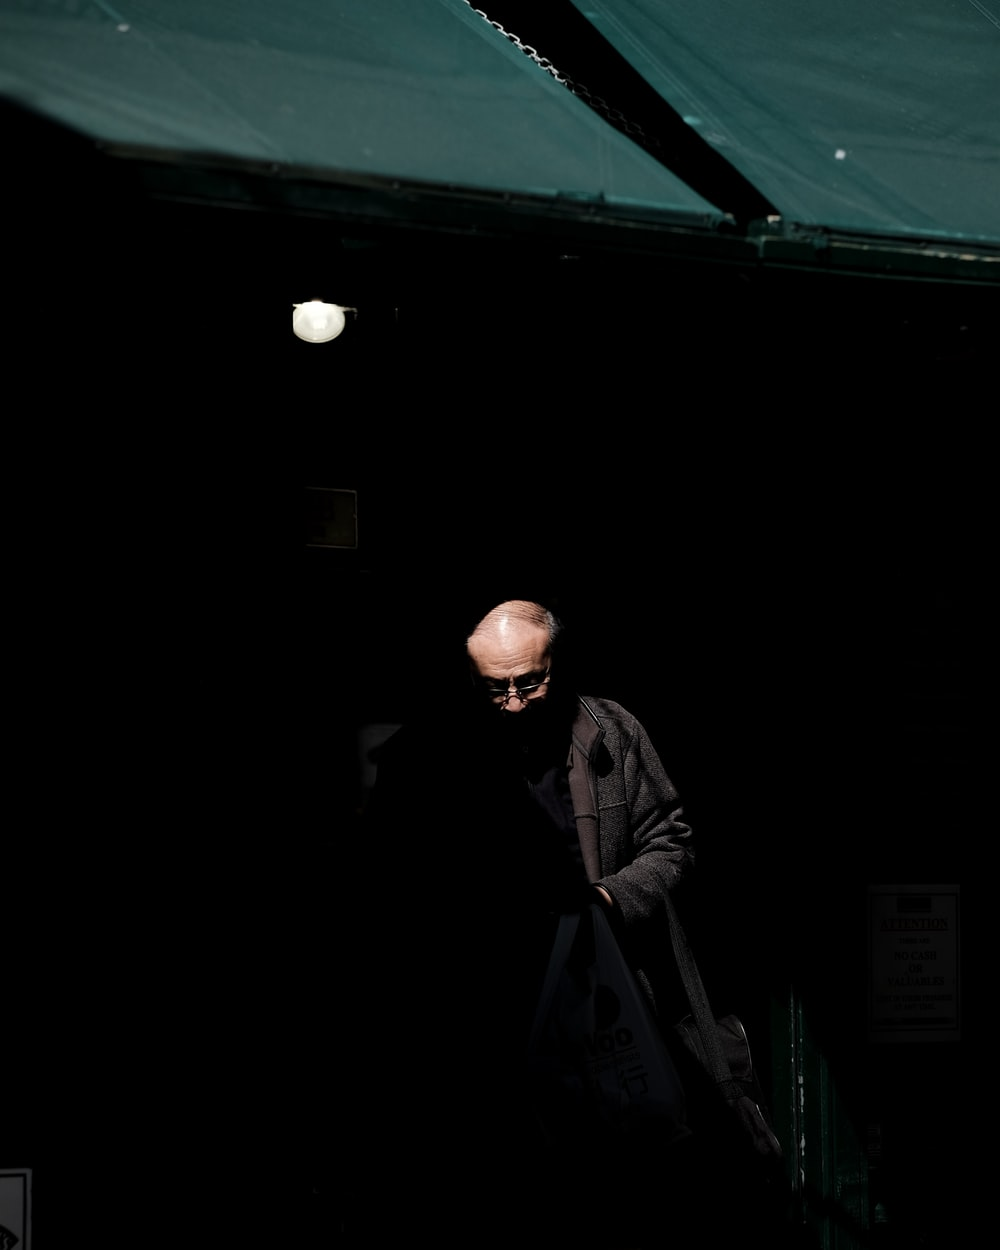 man wearing black jacket inside dark room